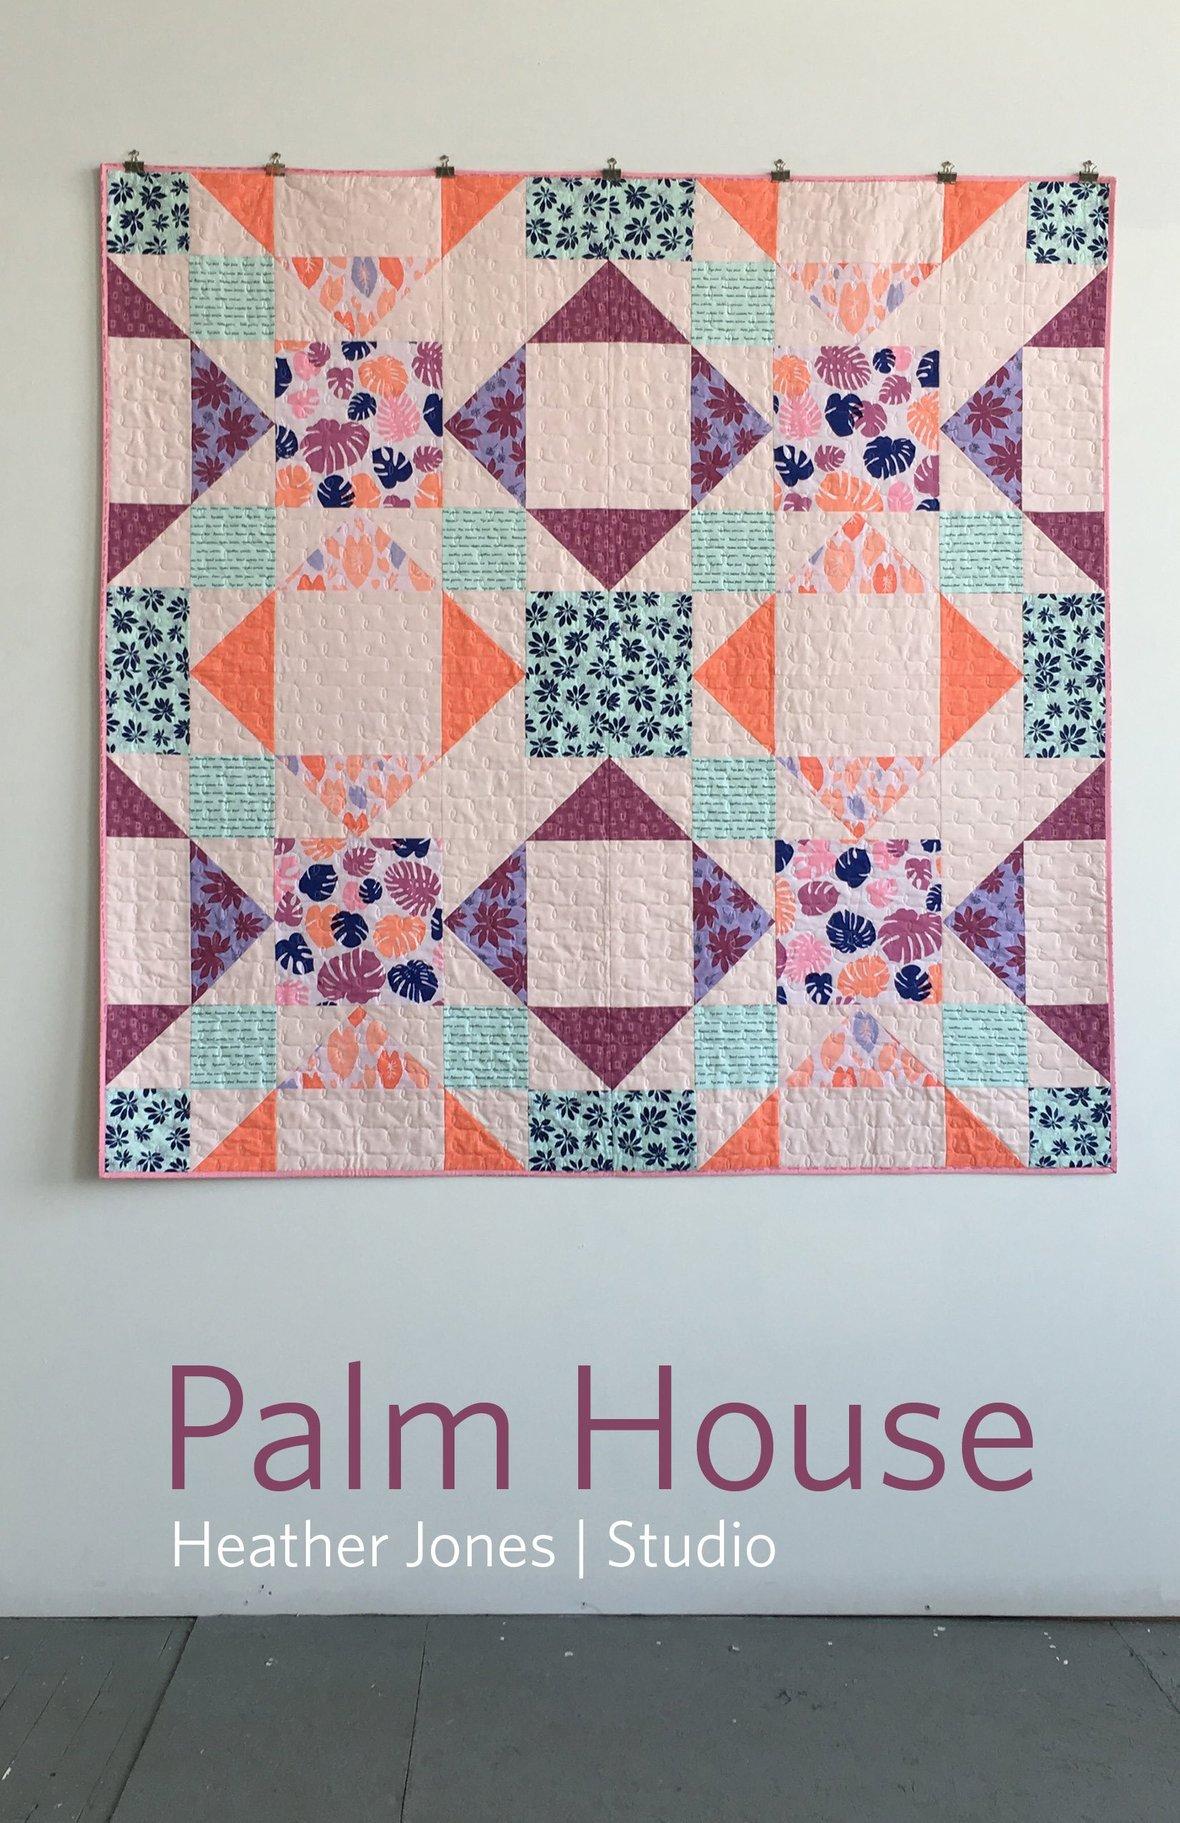 heather jones palm house sewing pattern